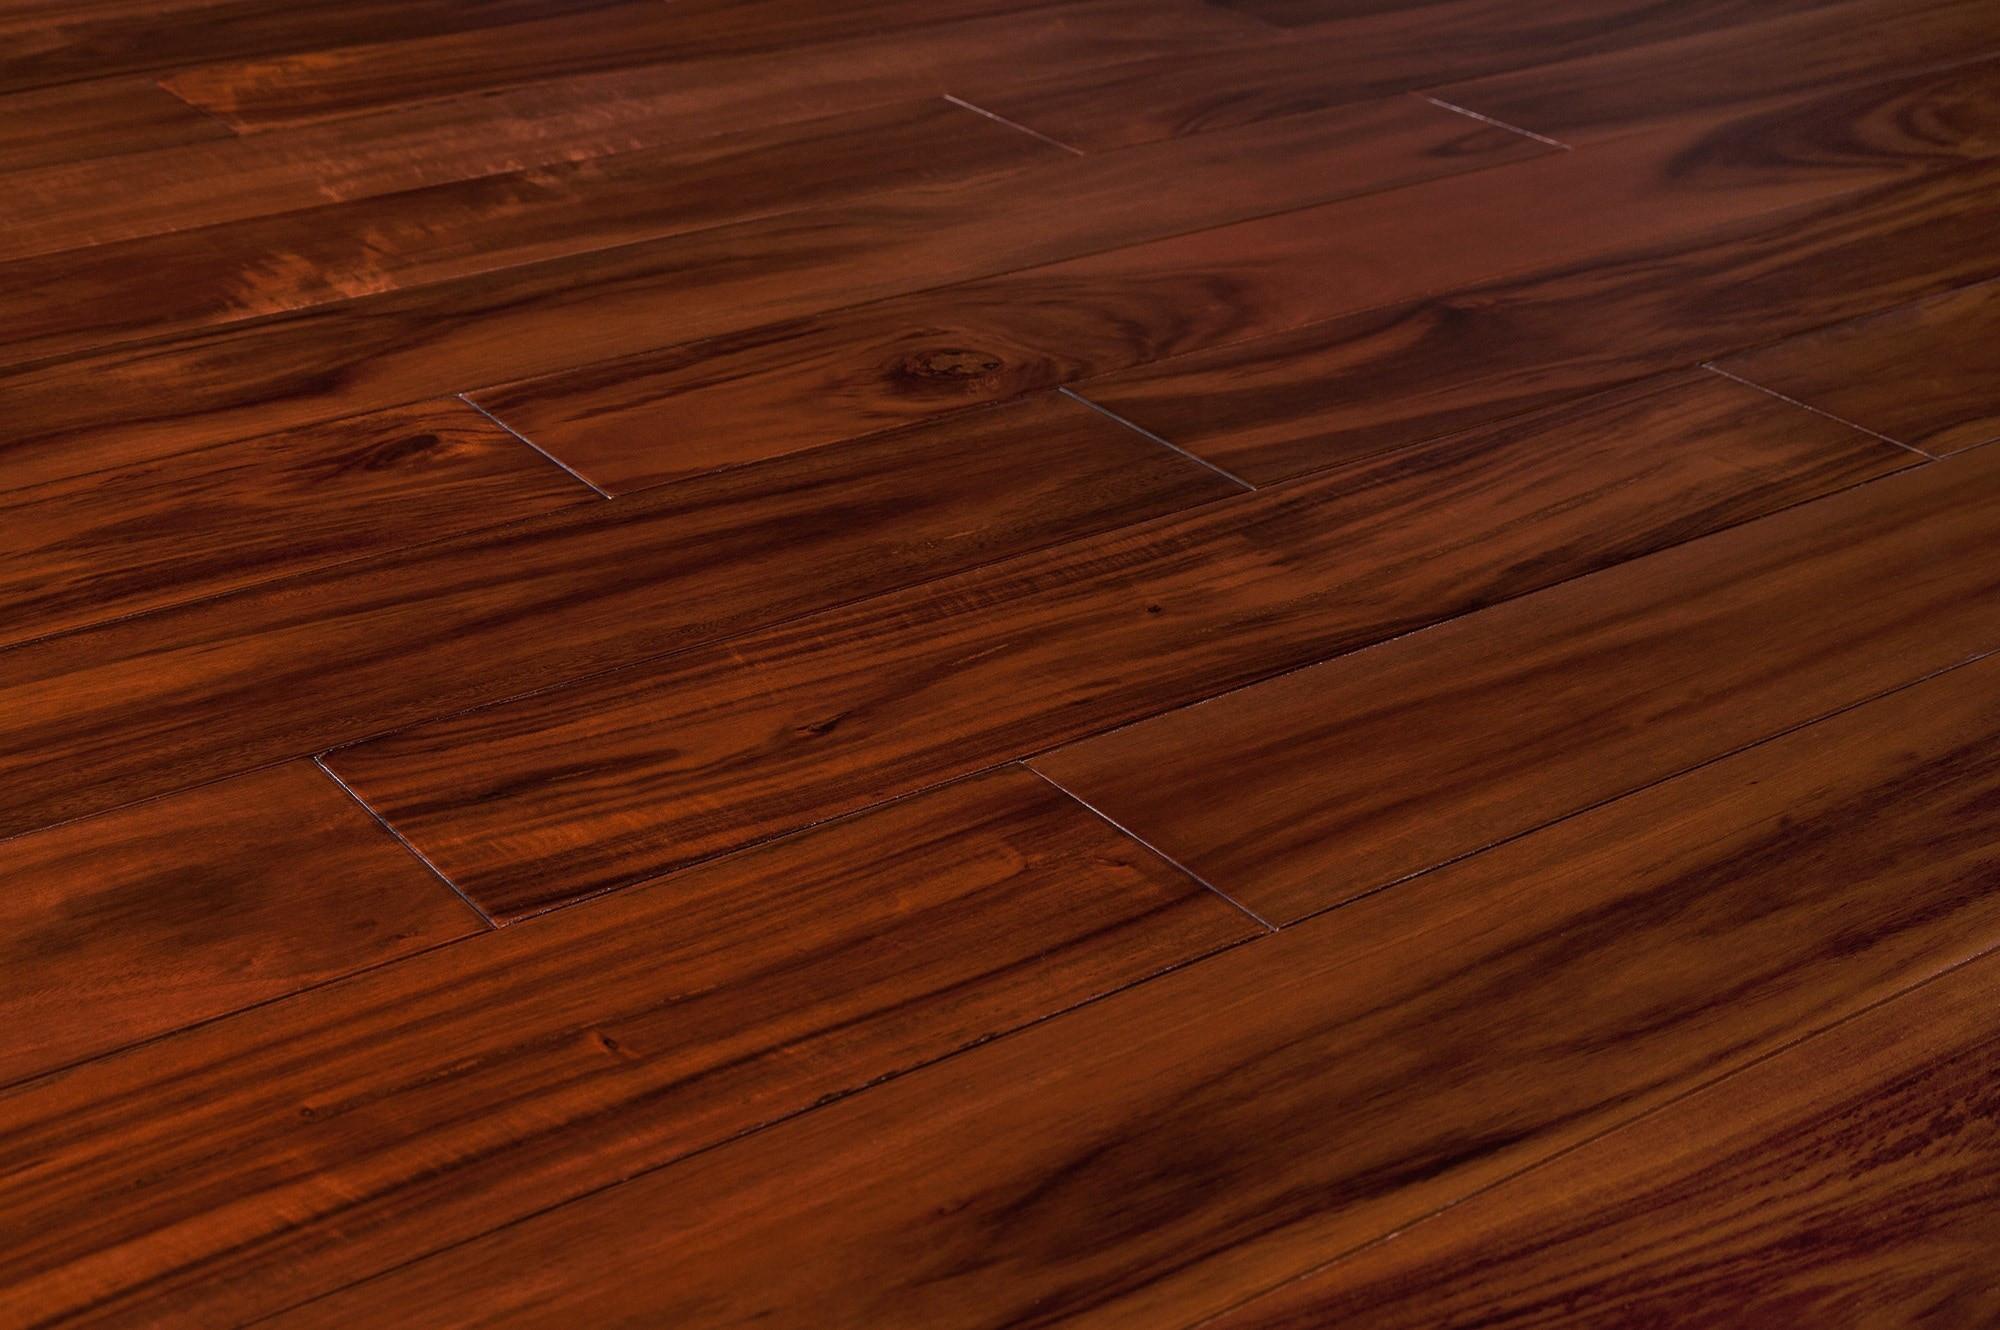 vintage white oak hardwood flooring of 14 unique acacia solid hardwood flooring pics dizpos com throughout acacia solid hardwood flooring new clearance wood flooring house unique wide plank solid hardwood with photograph